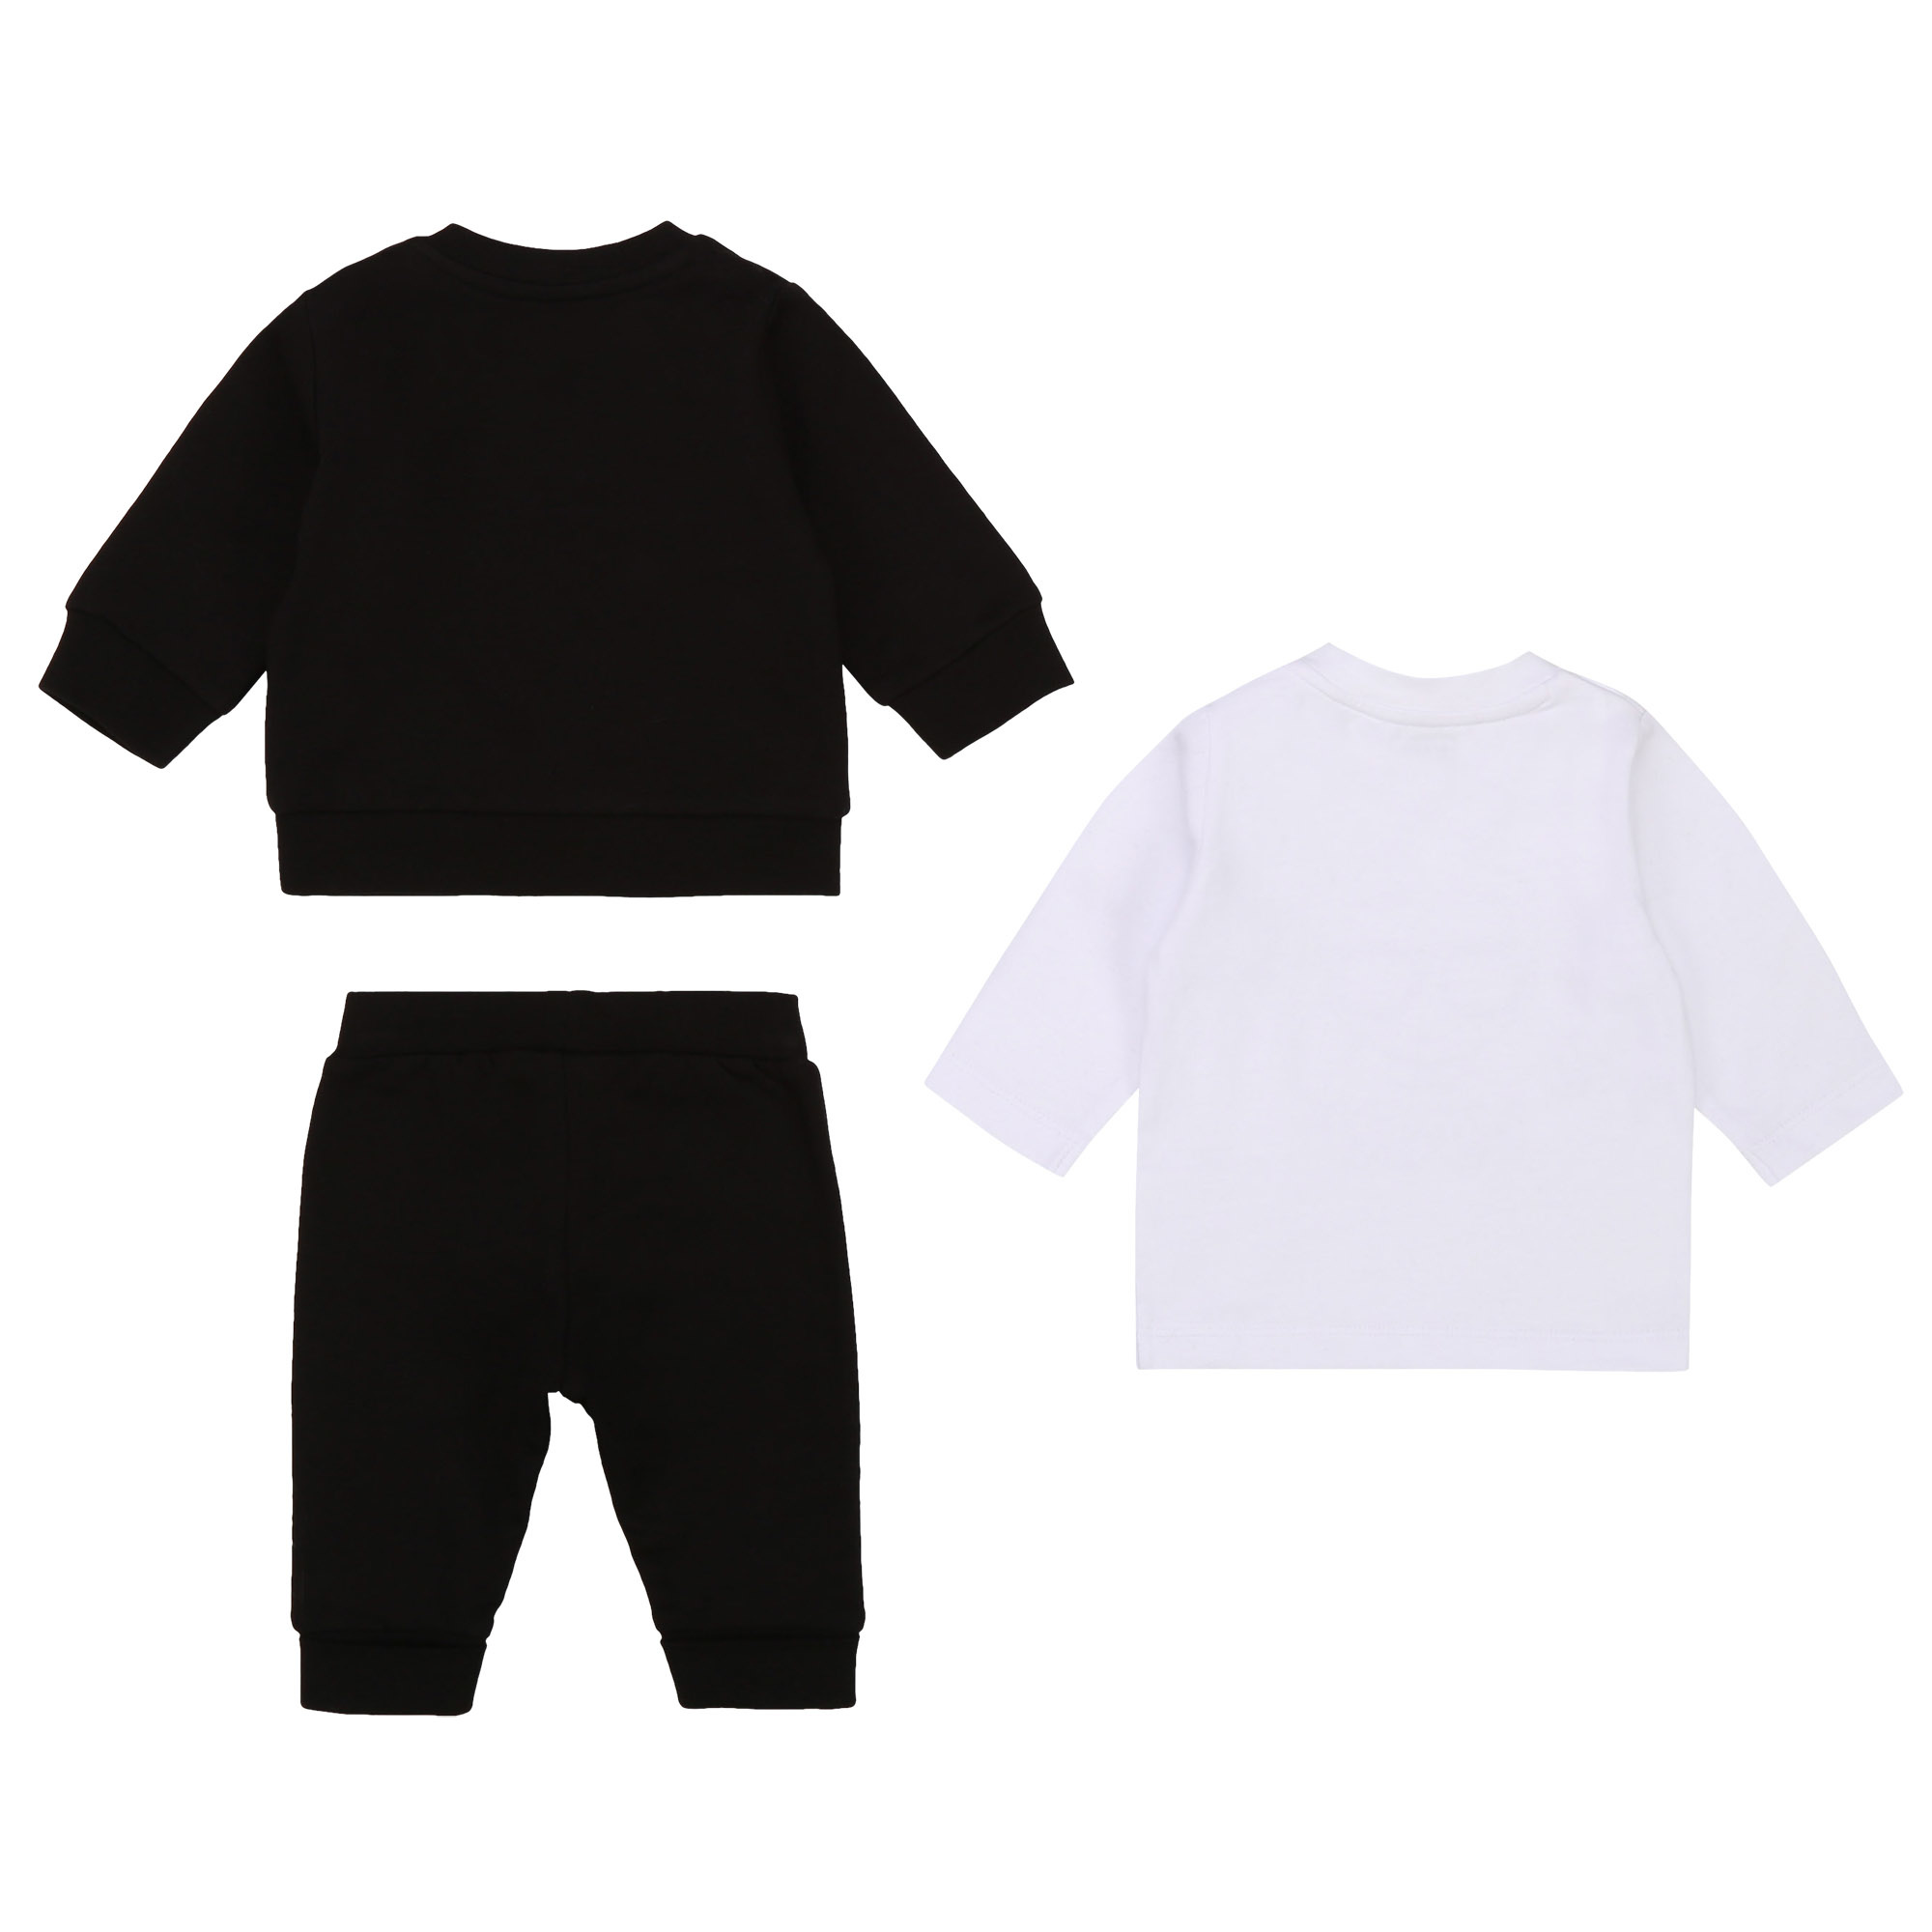 KARL LAGERFELD KIDS jogging 3 pièces jersey coton-2